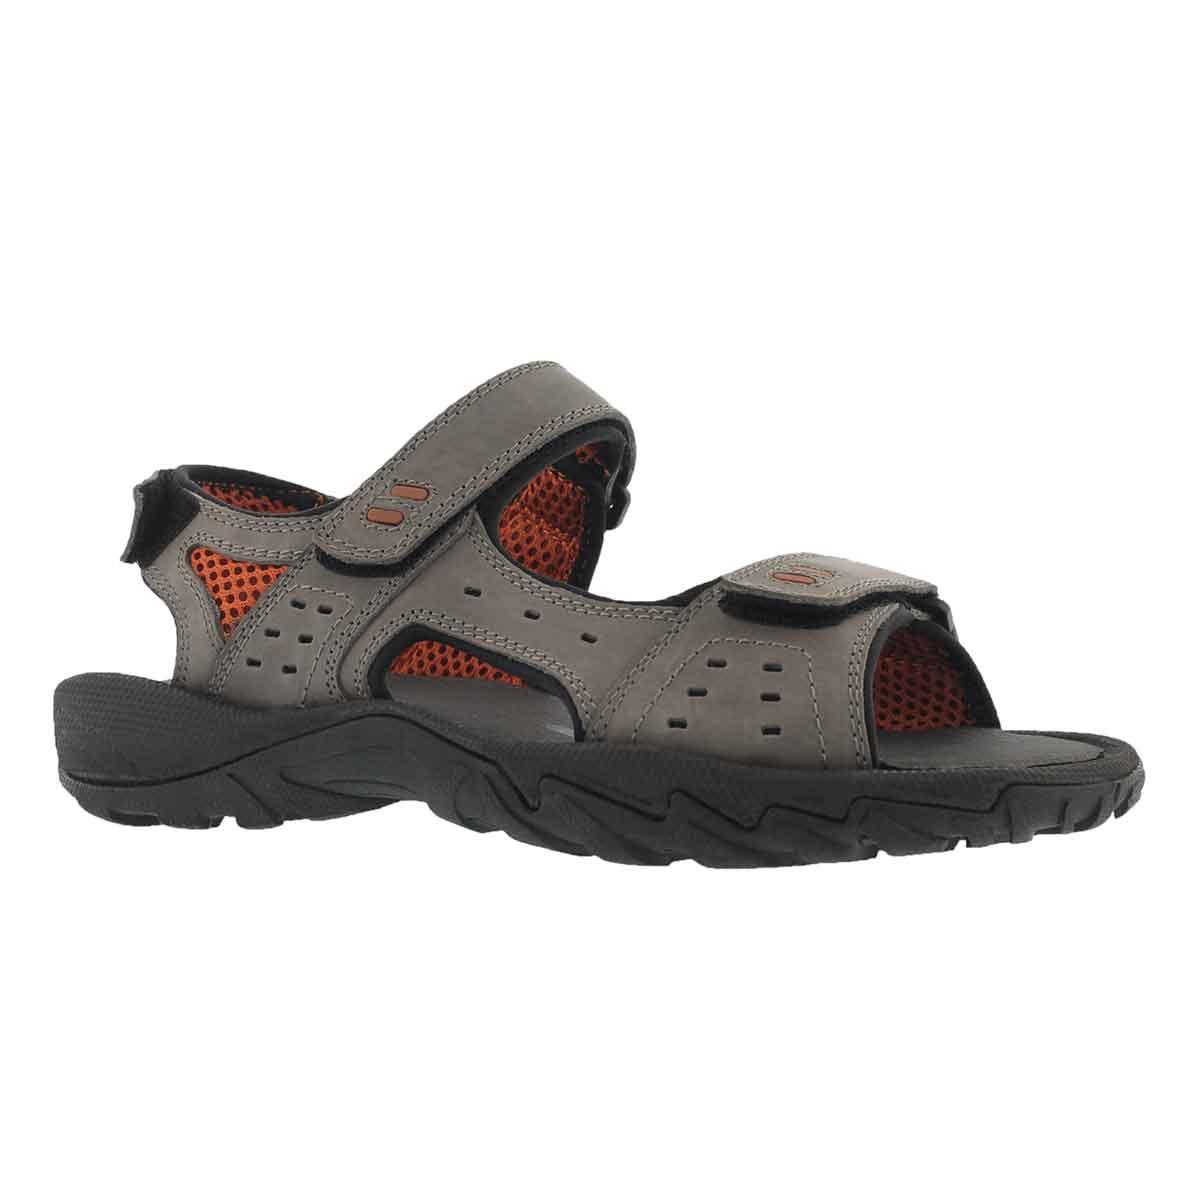 Men's LUCIUS 3 grey 3 strap sport sandals